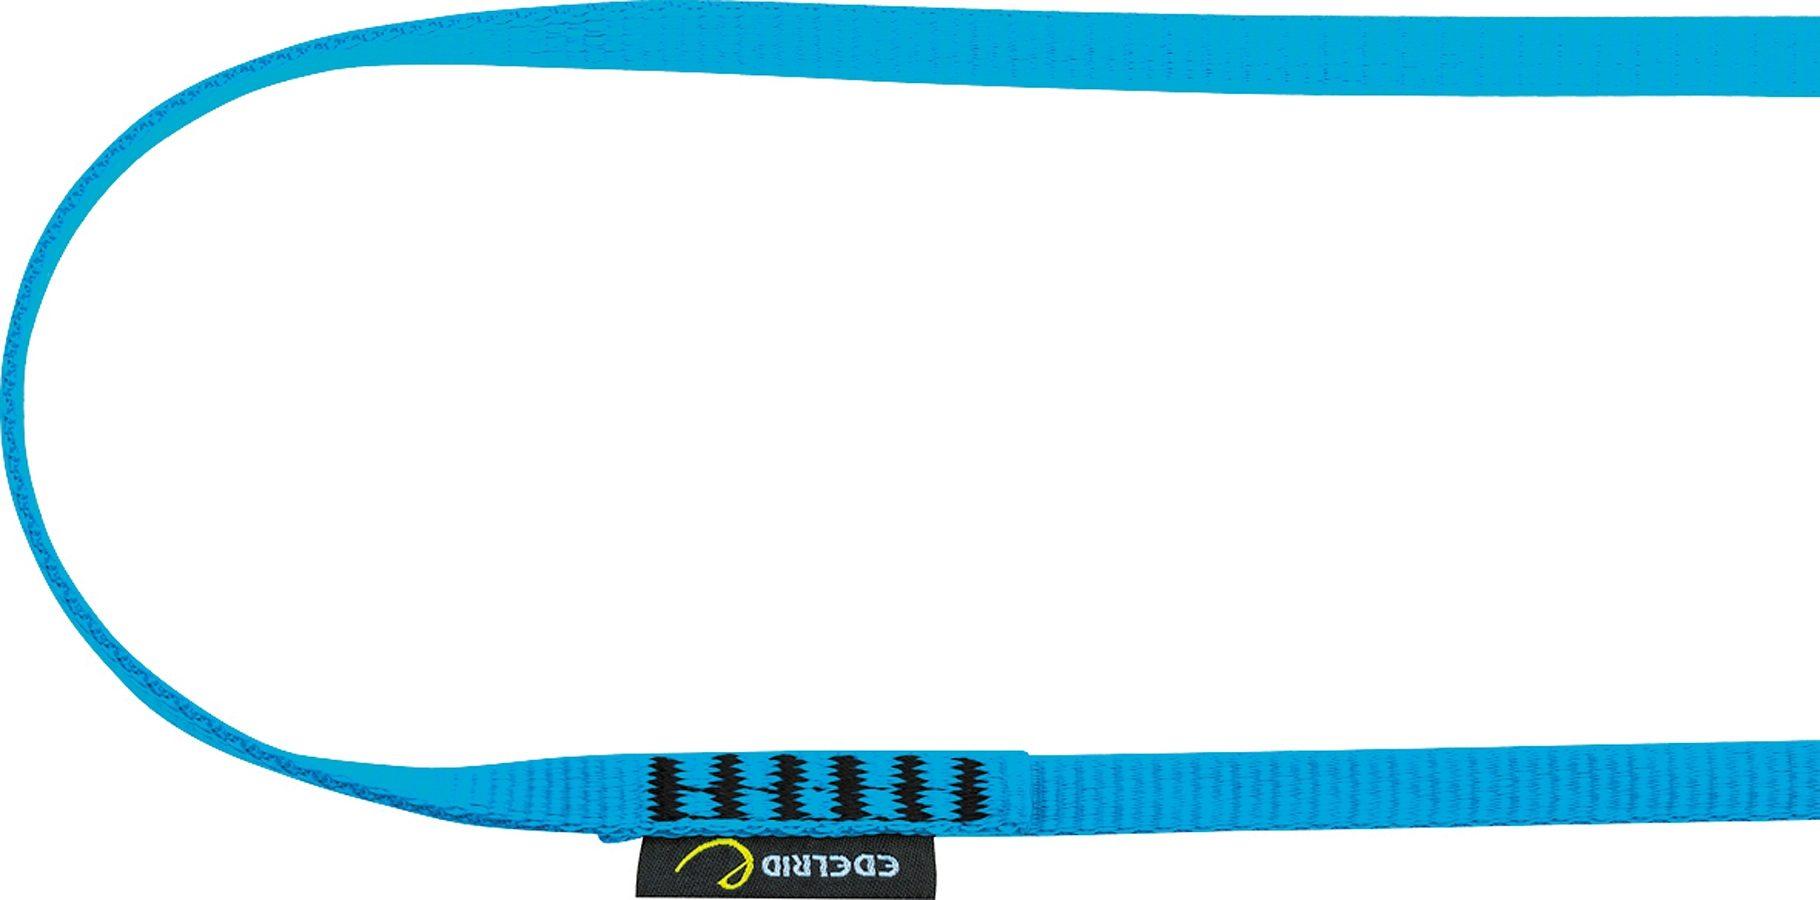 Edelrid Outdoor-Equipment »Tec Web Sling 12mm 120cm«